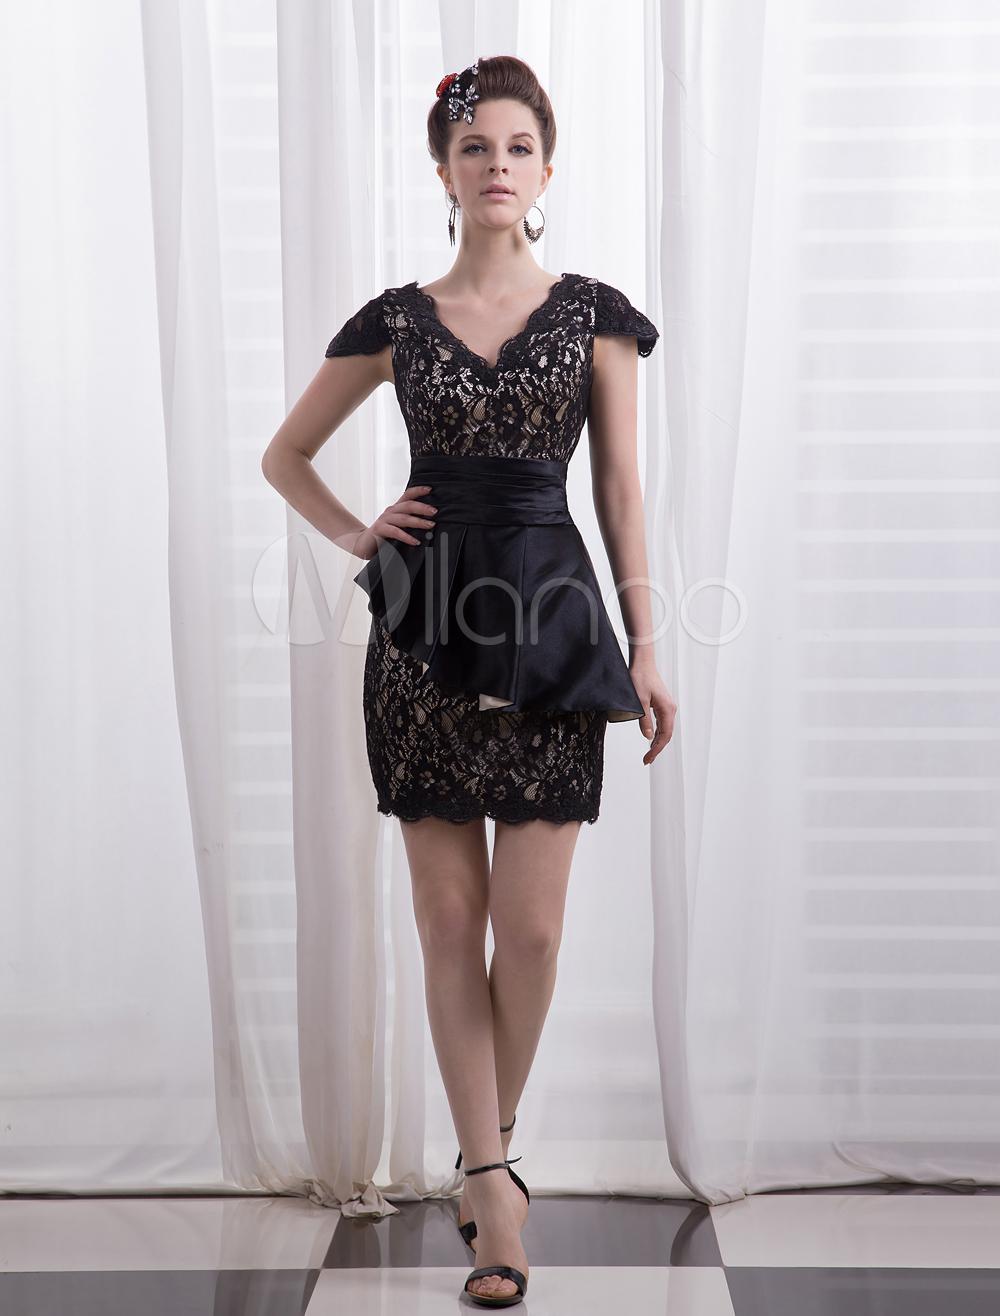 Black Sheath V-Neck Peplum Short Sleeves Lace Cocktail Dress Milanoo